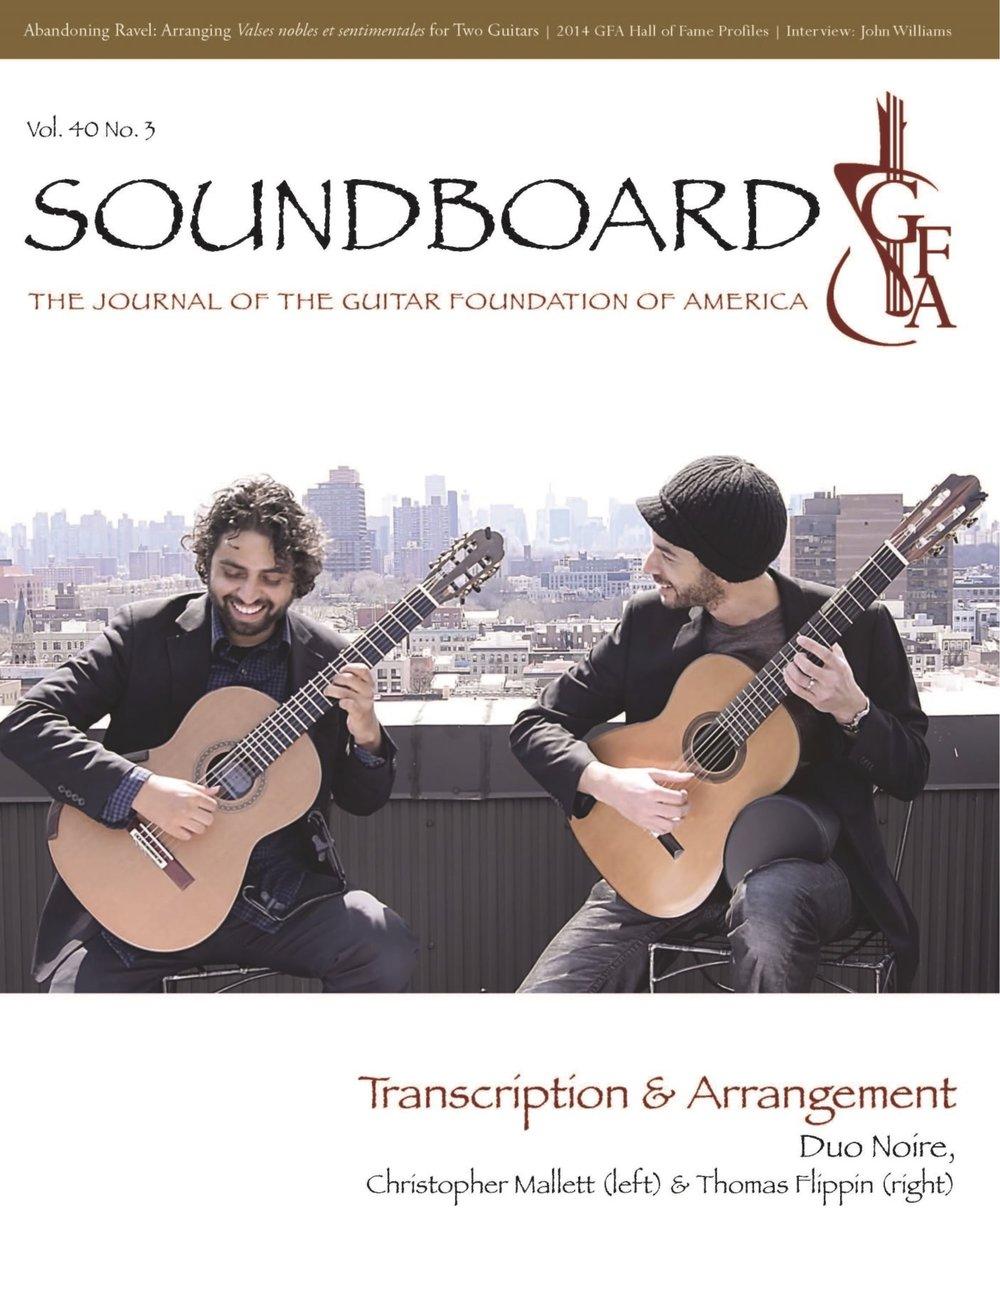 Guitar Foundation of America's Soundboard